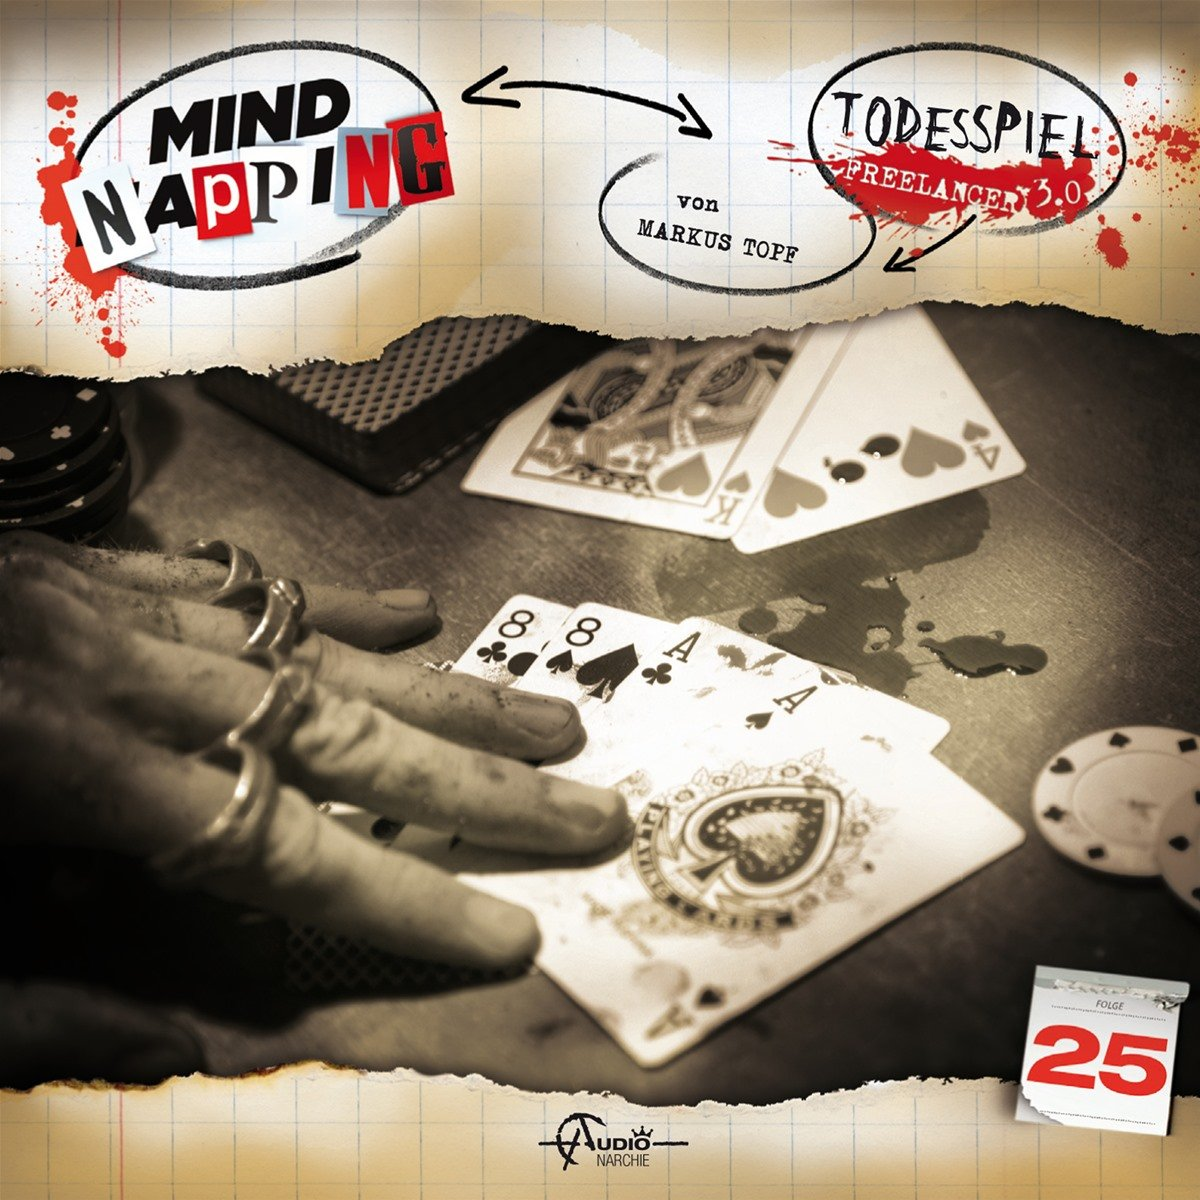 MindNapping (25) Todesspiel - Freelancer 3.0 - Audionarchie 2017